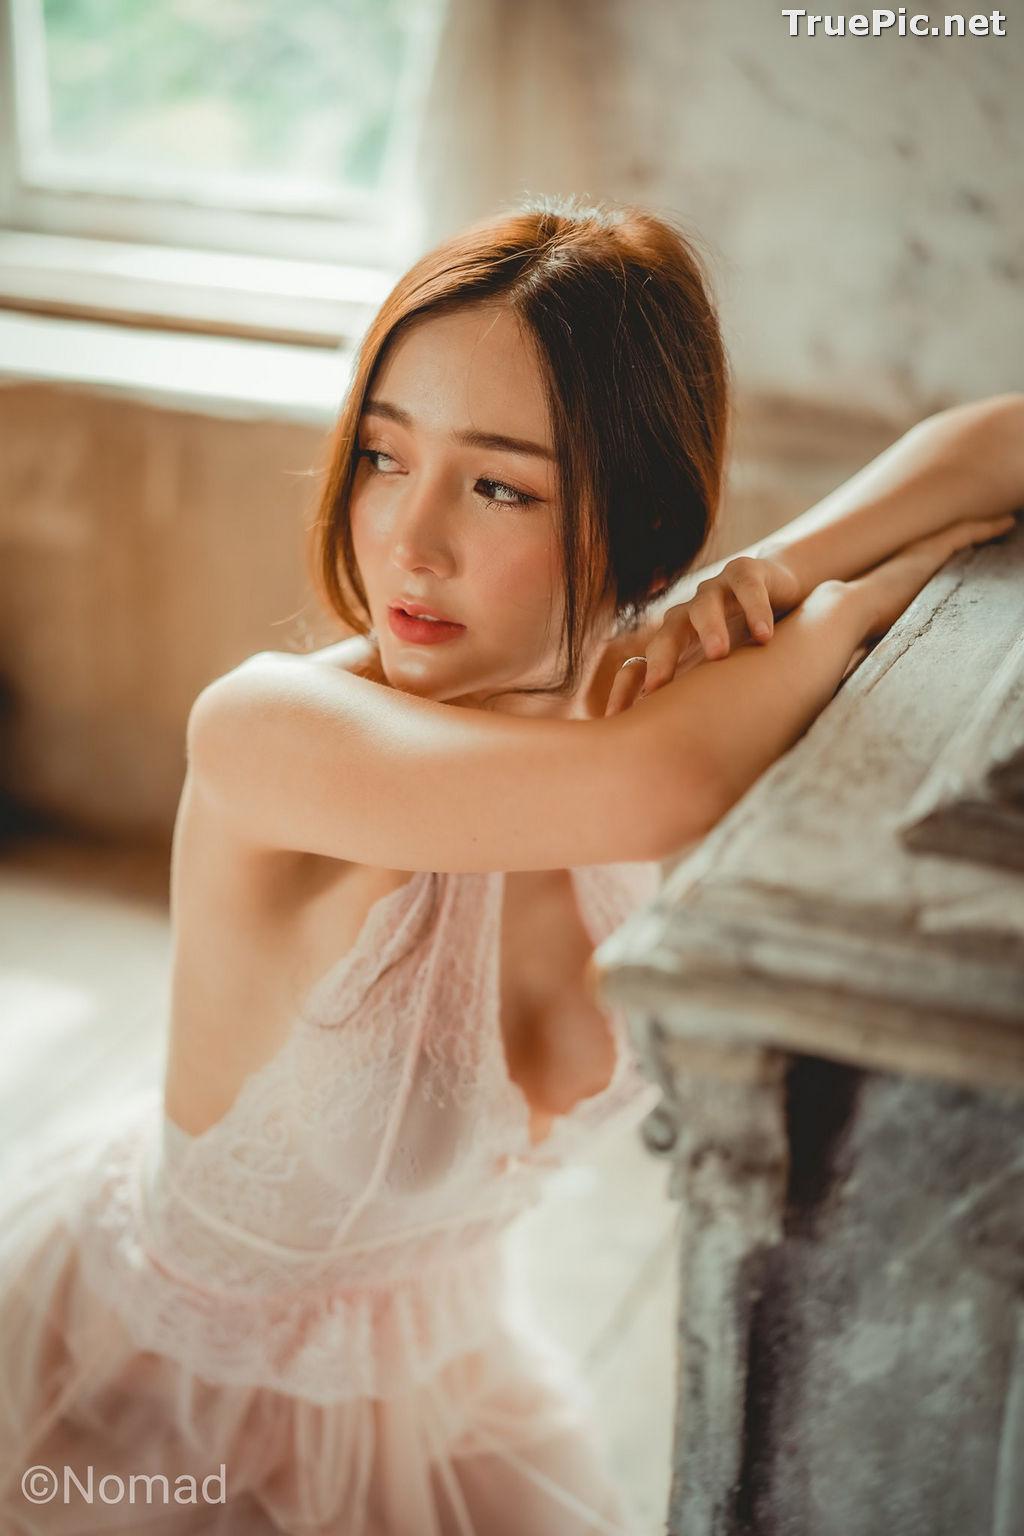 Image Thailand Model - Rossarin Klinhom - Sexy Transparent Dress - TruePic.net - Picture-8